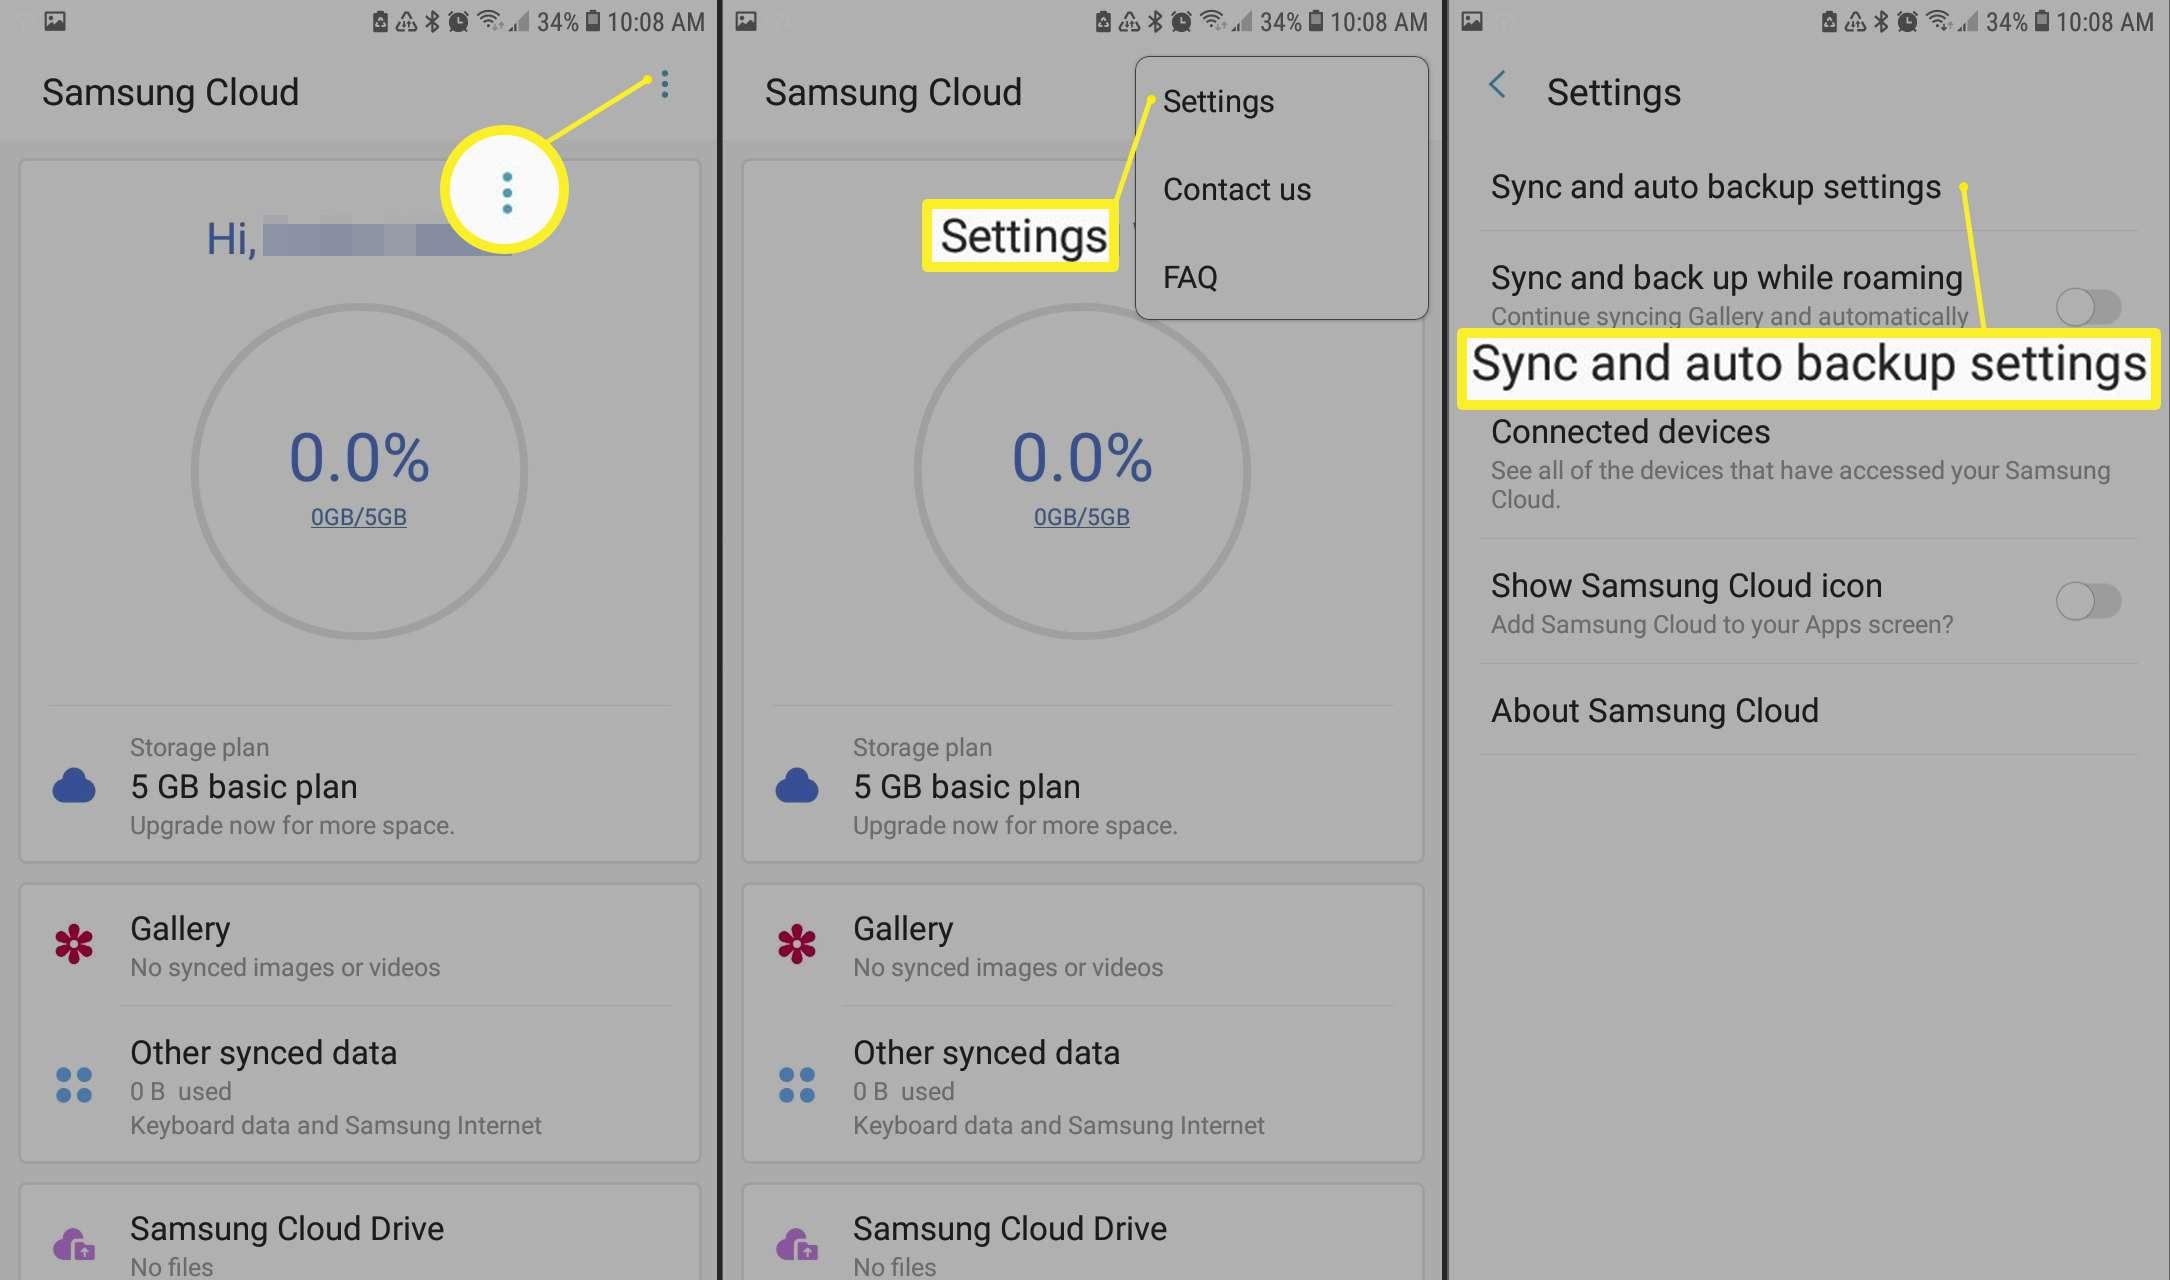 Menu > Settings > Sync and auto backup settings